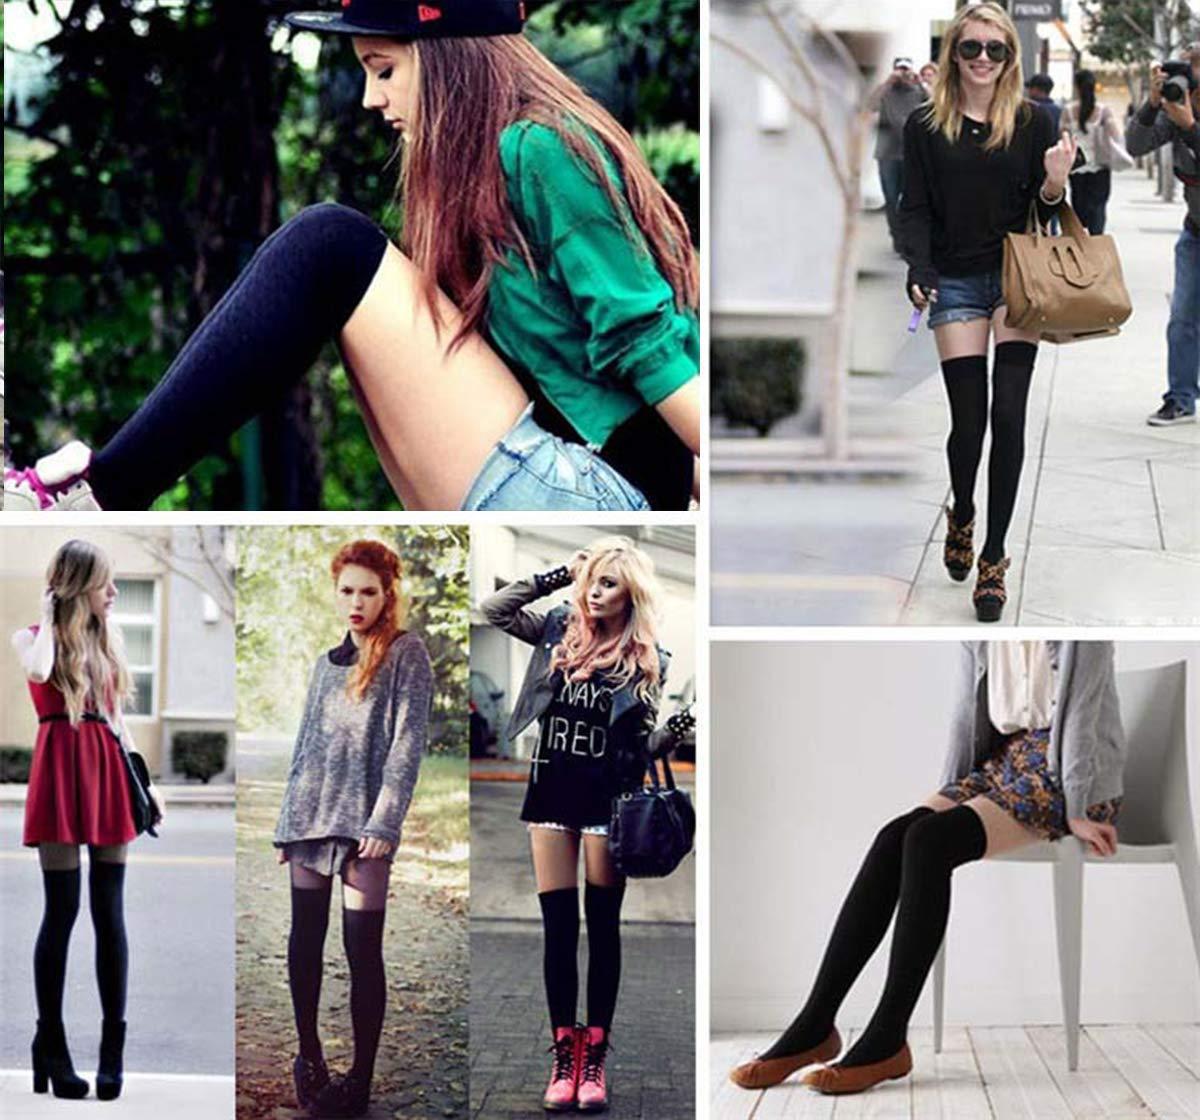 FIBO STEEL 6-9 Pairs Long Thigh High Socks for Women Striped Knee High Leg Warmers